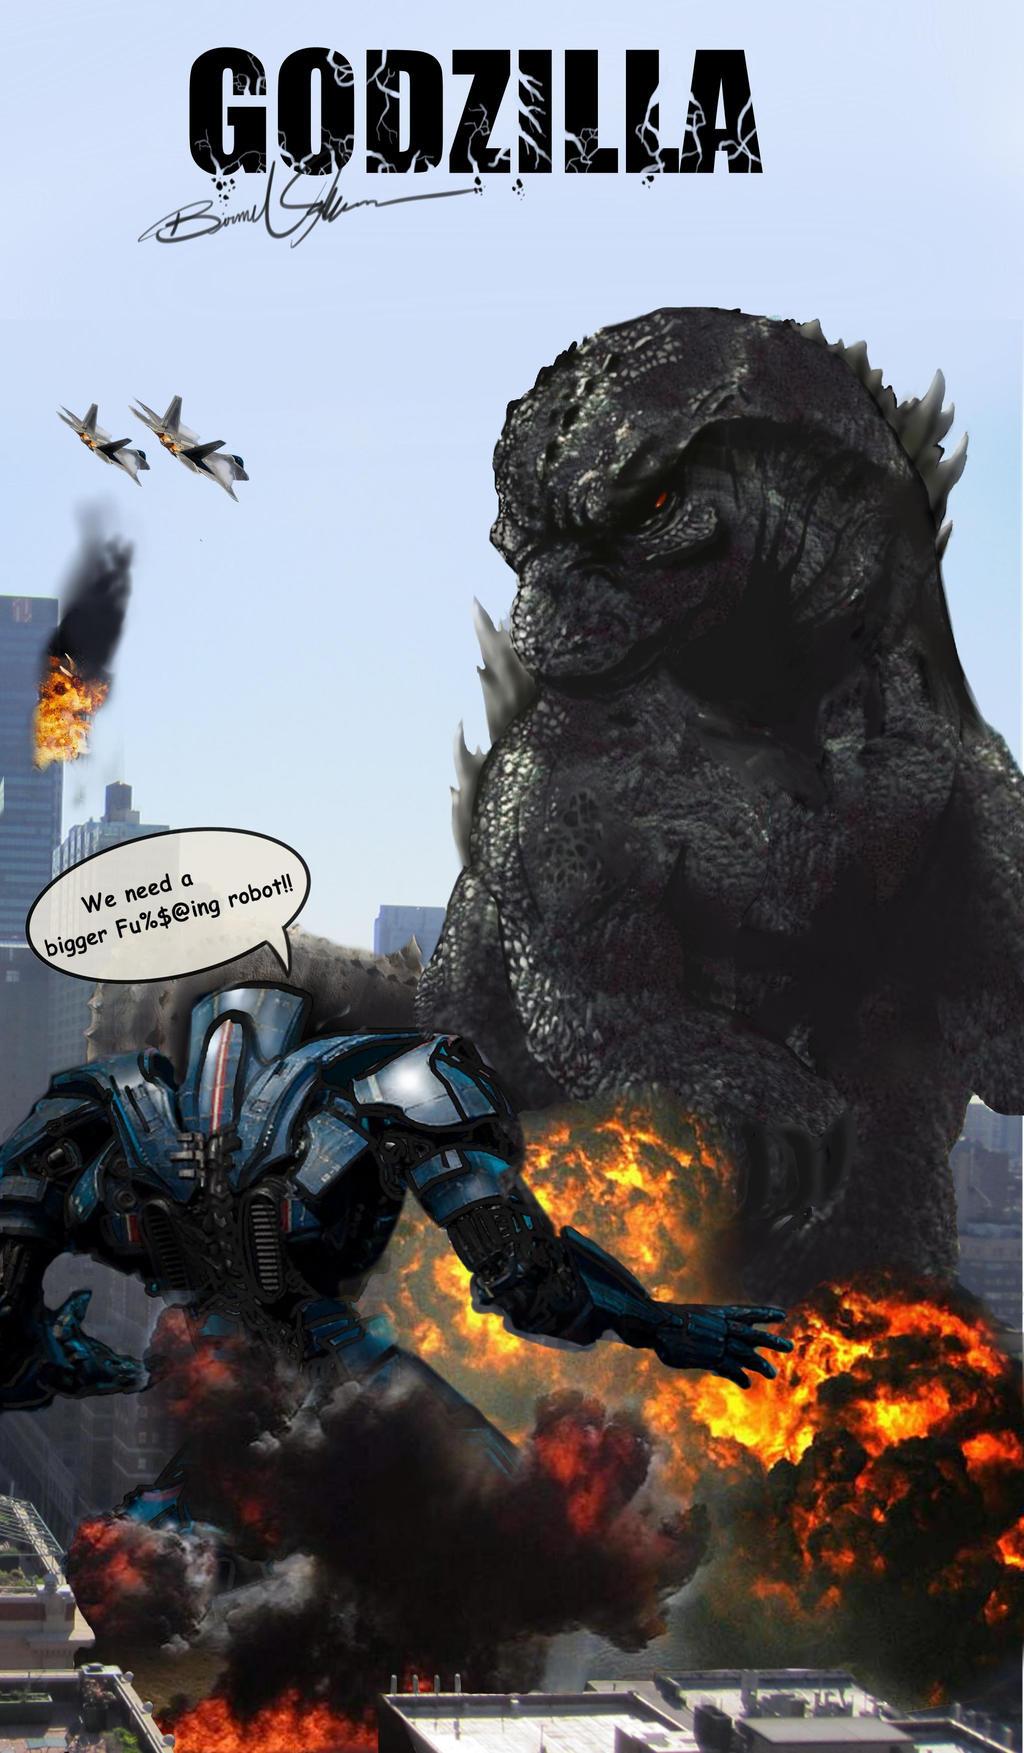 Godzilla Poster 2014 Comic by BirmeliniGodzilla 2014 Poster Comic Con